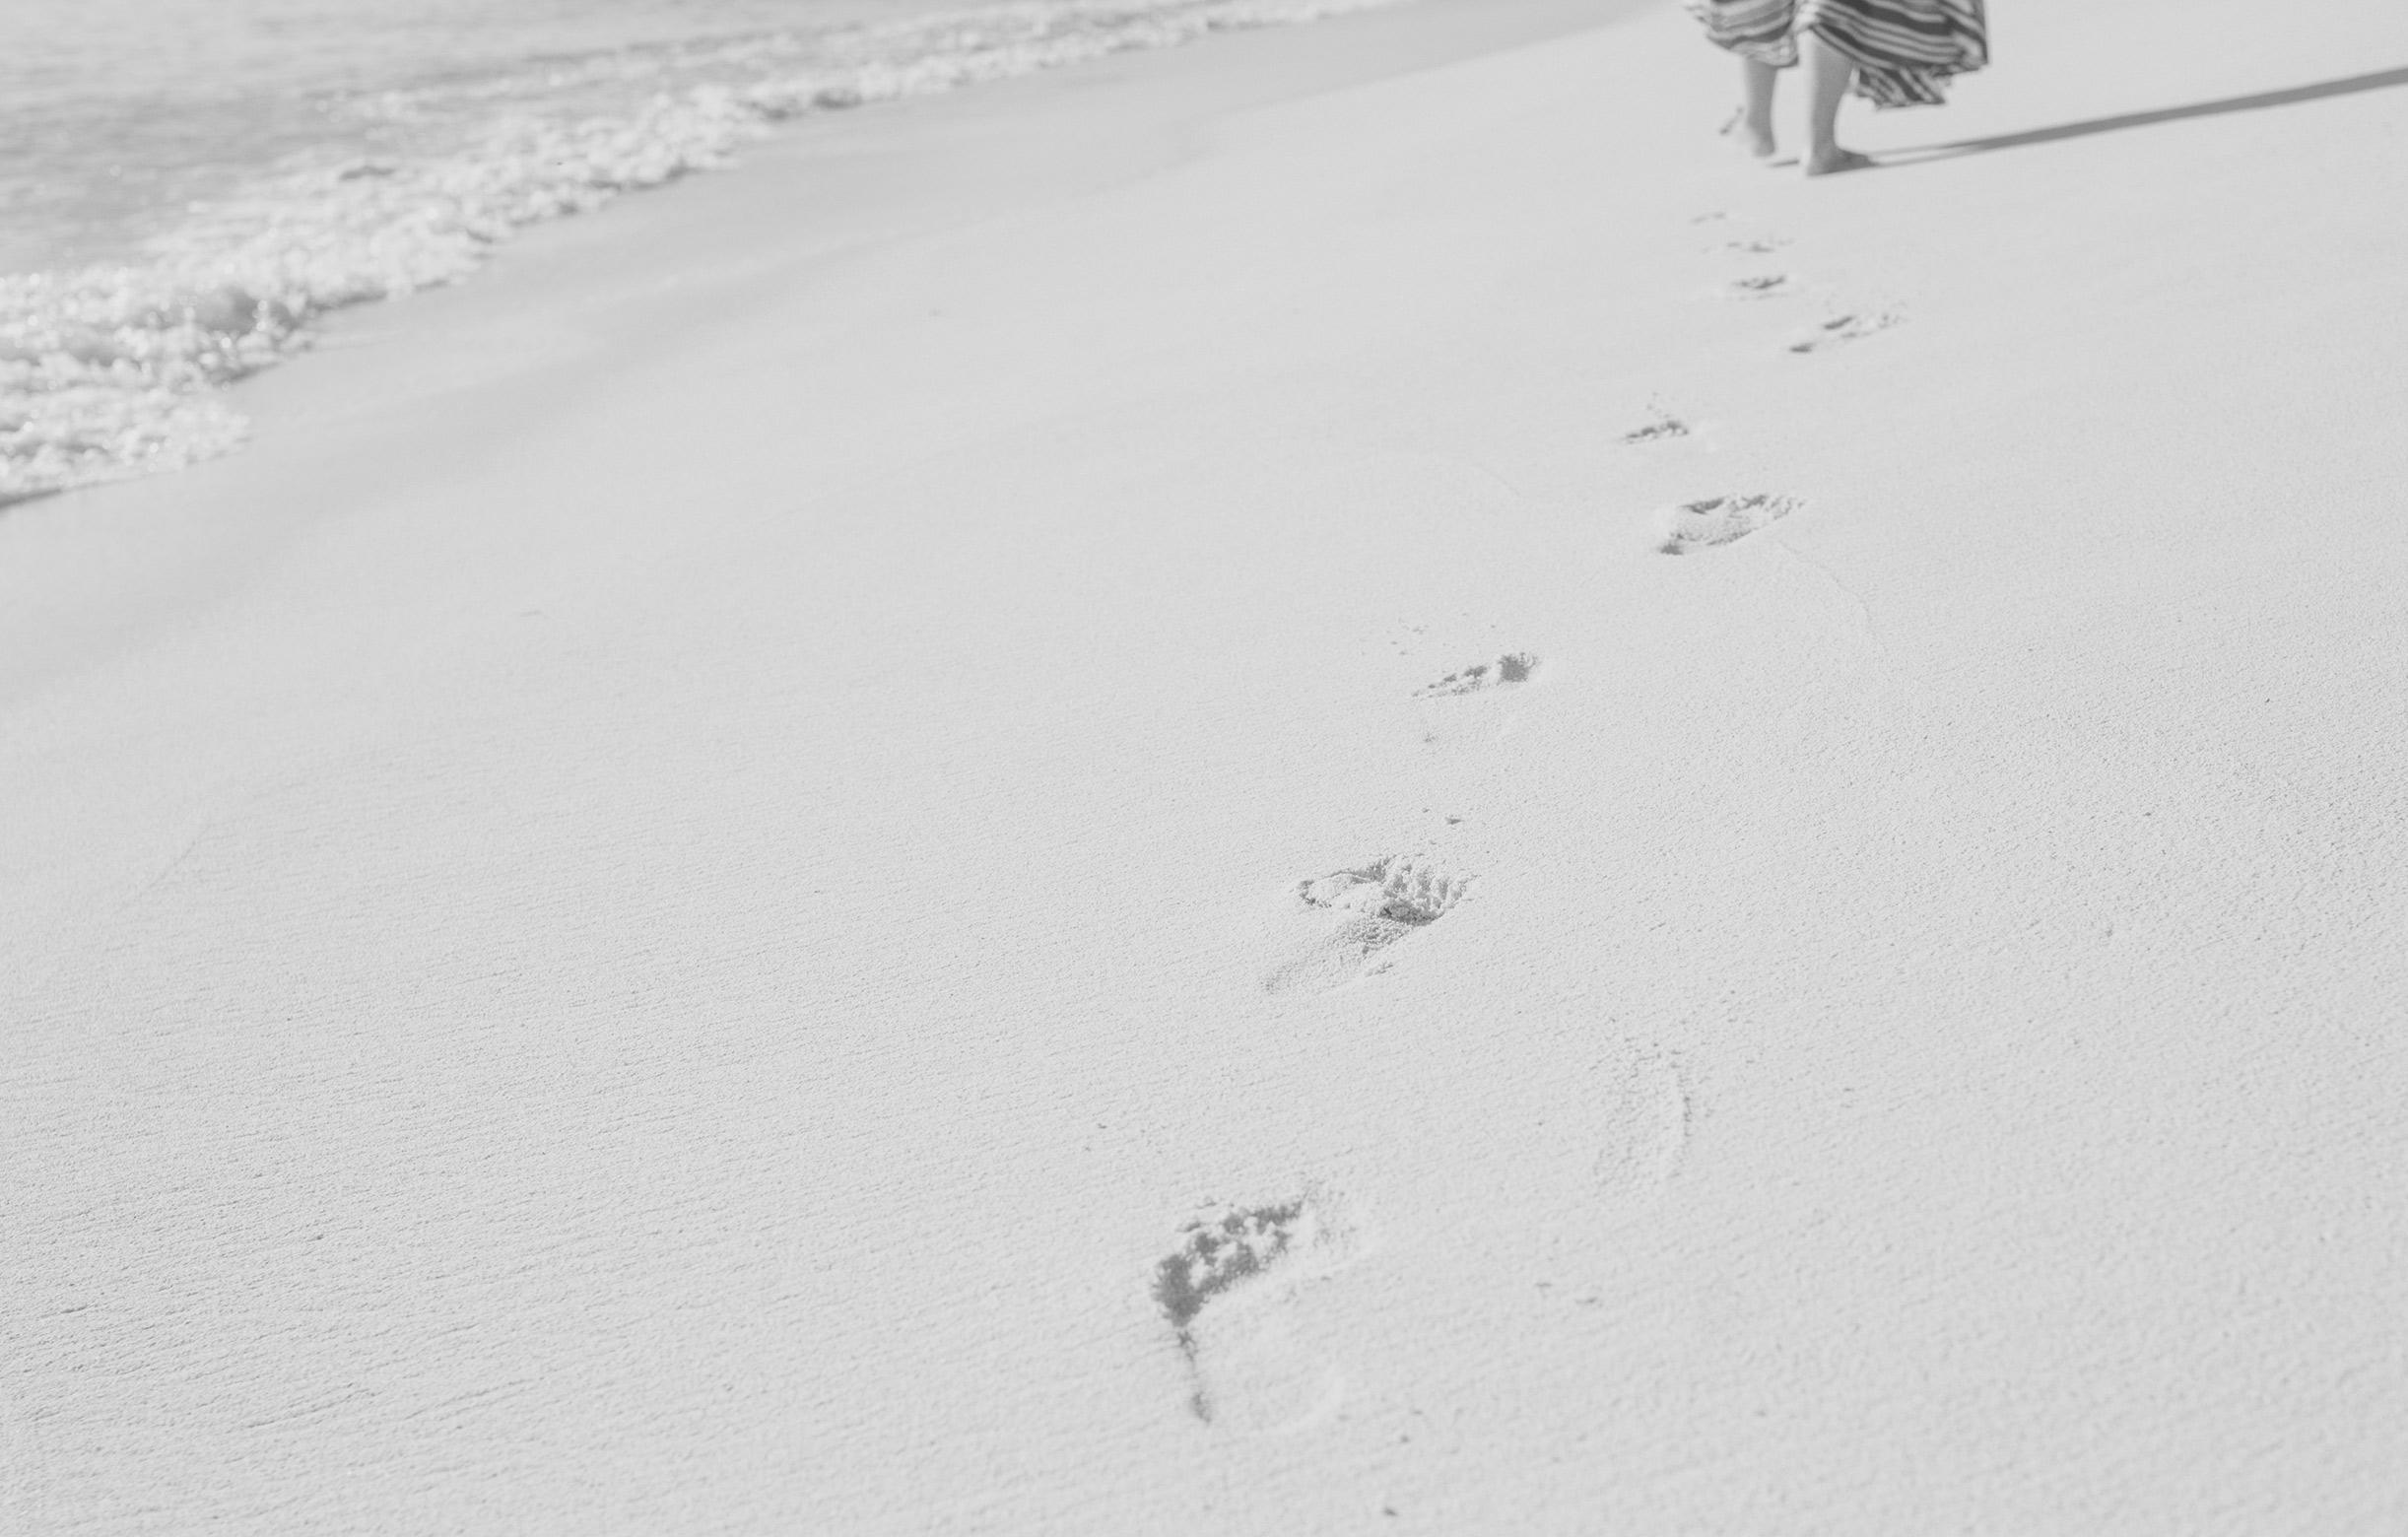 Fussspuren entlang eines Strandes